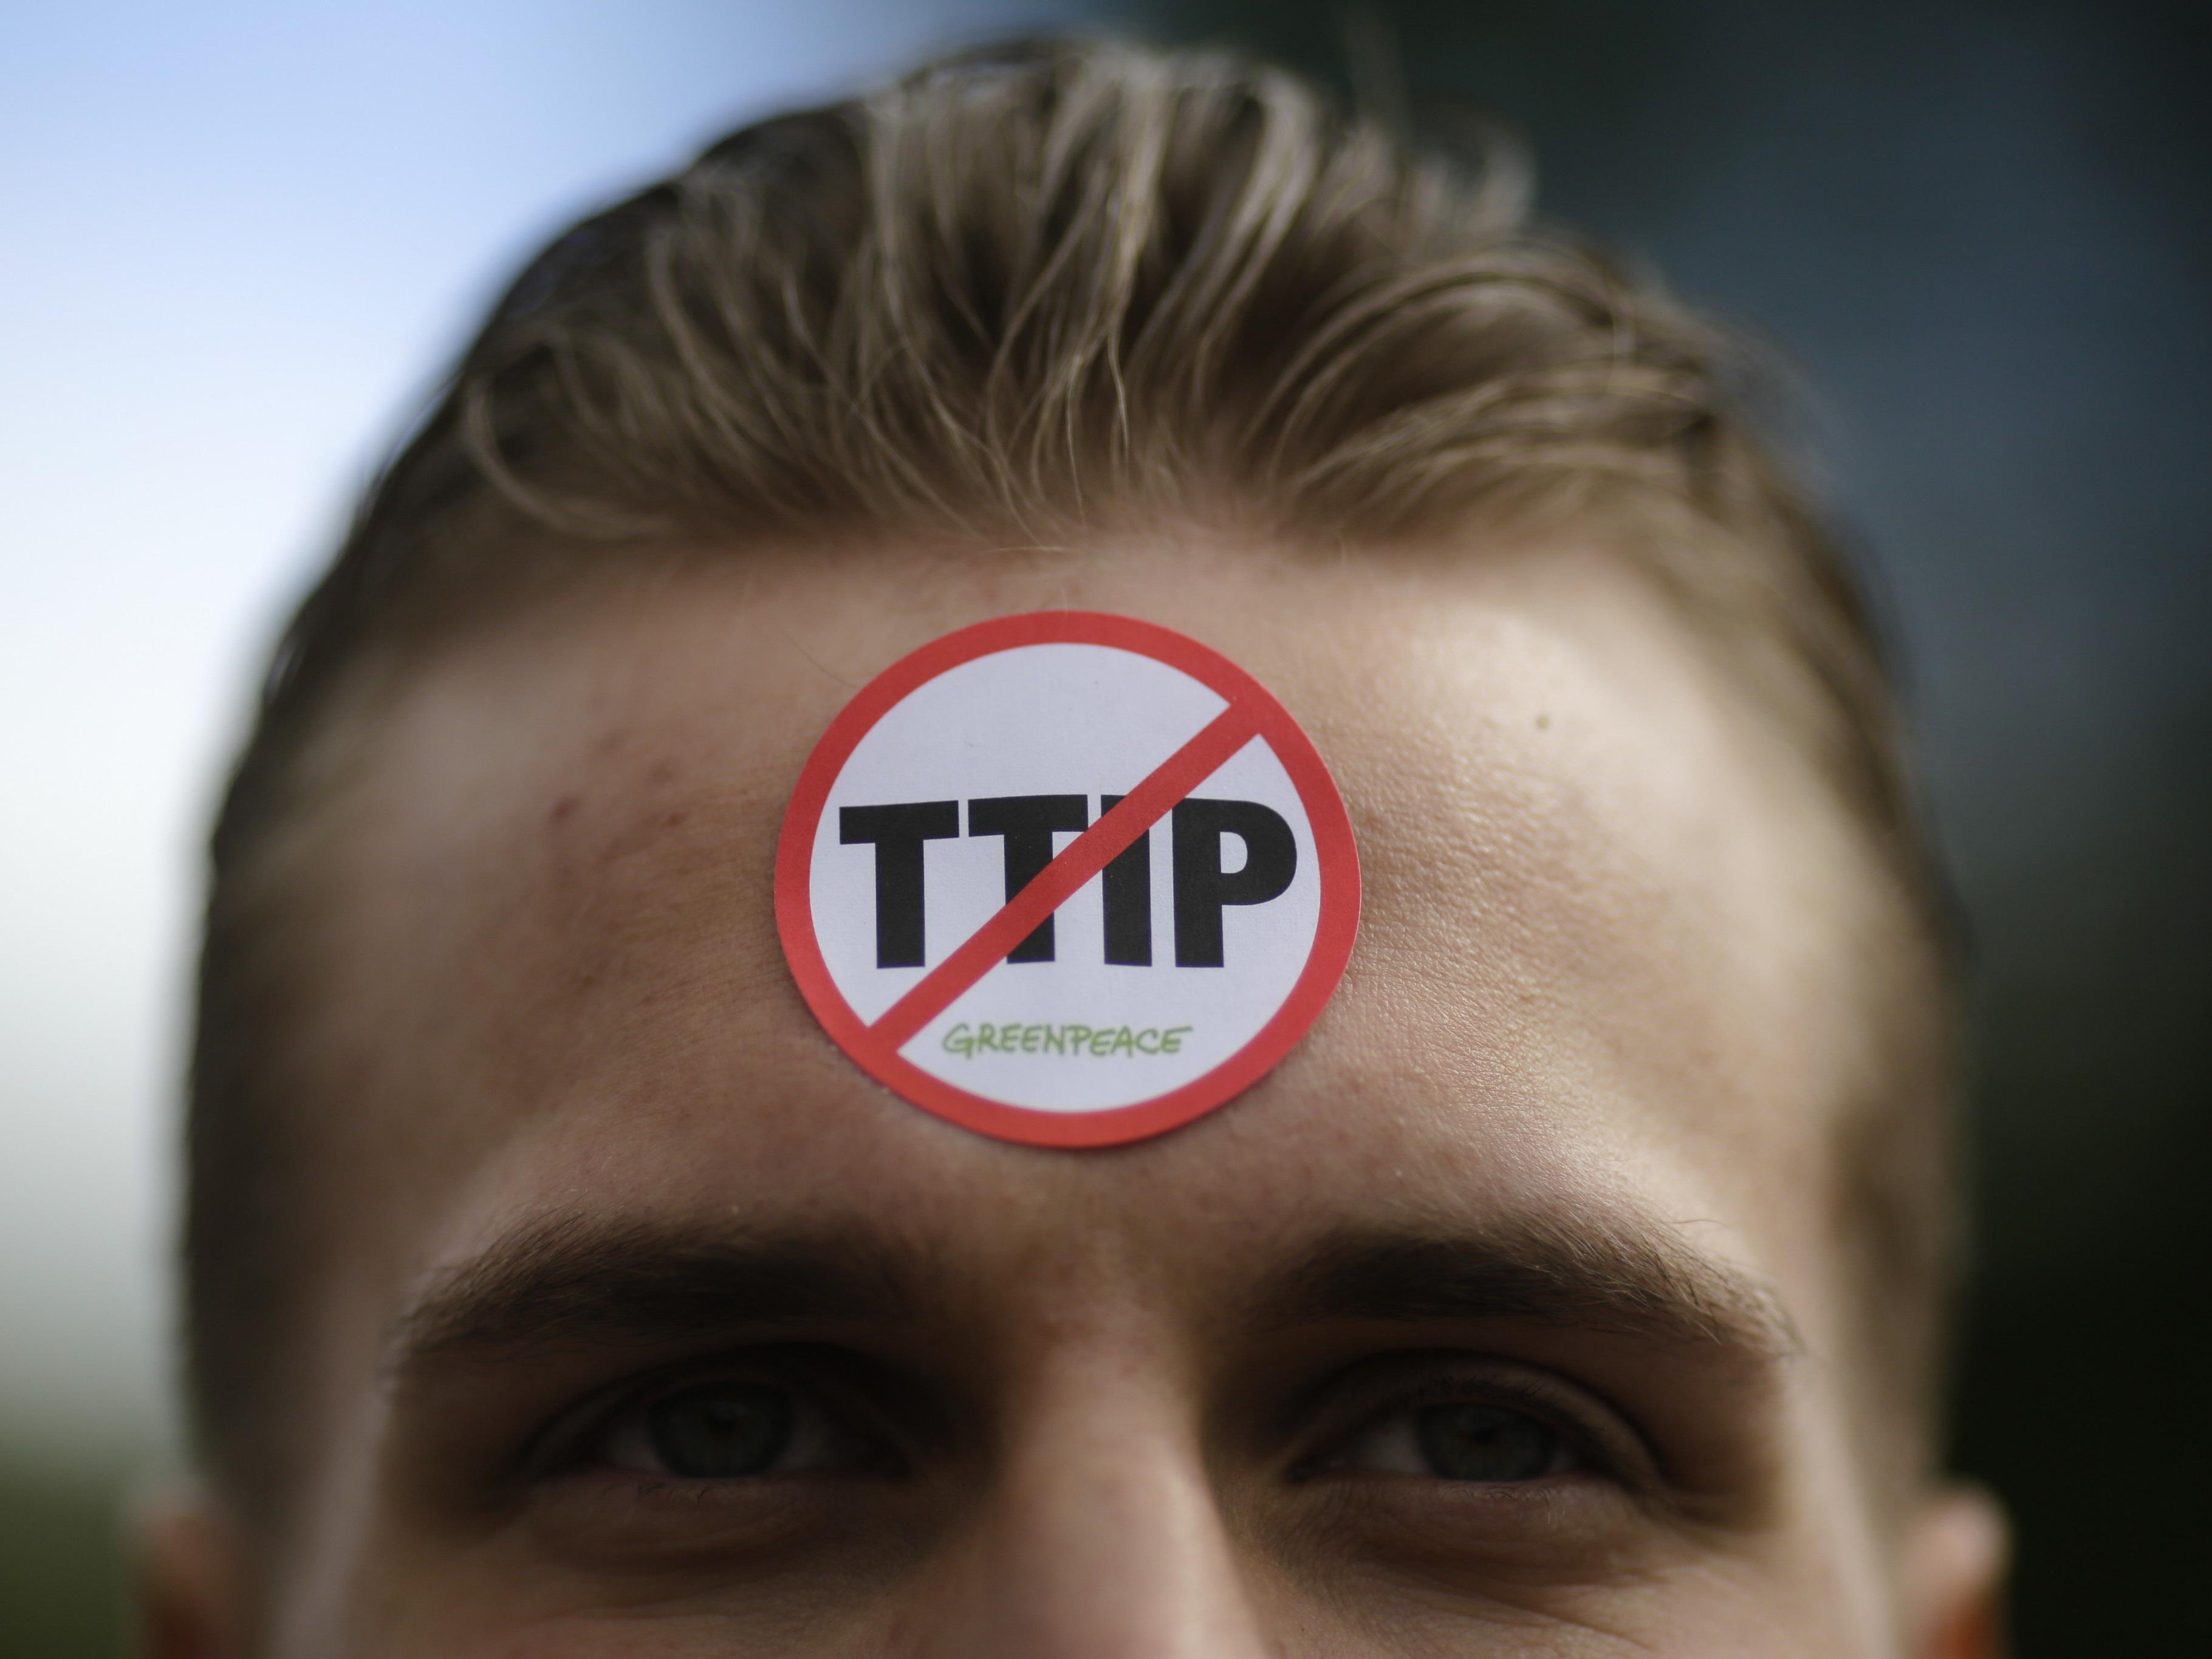 Verbraucherschutz: USA setzen EU laut Medienberichten extrem unter Druck.